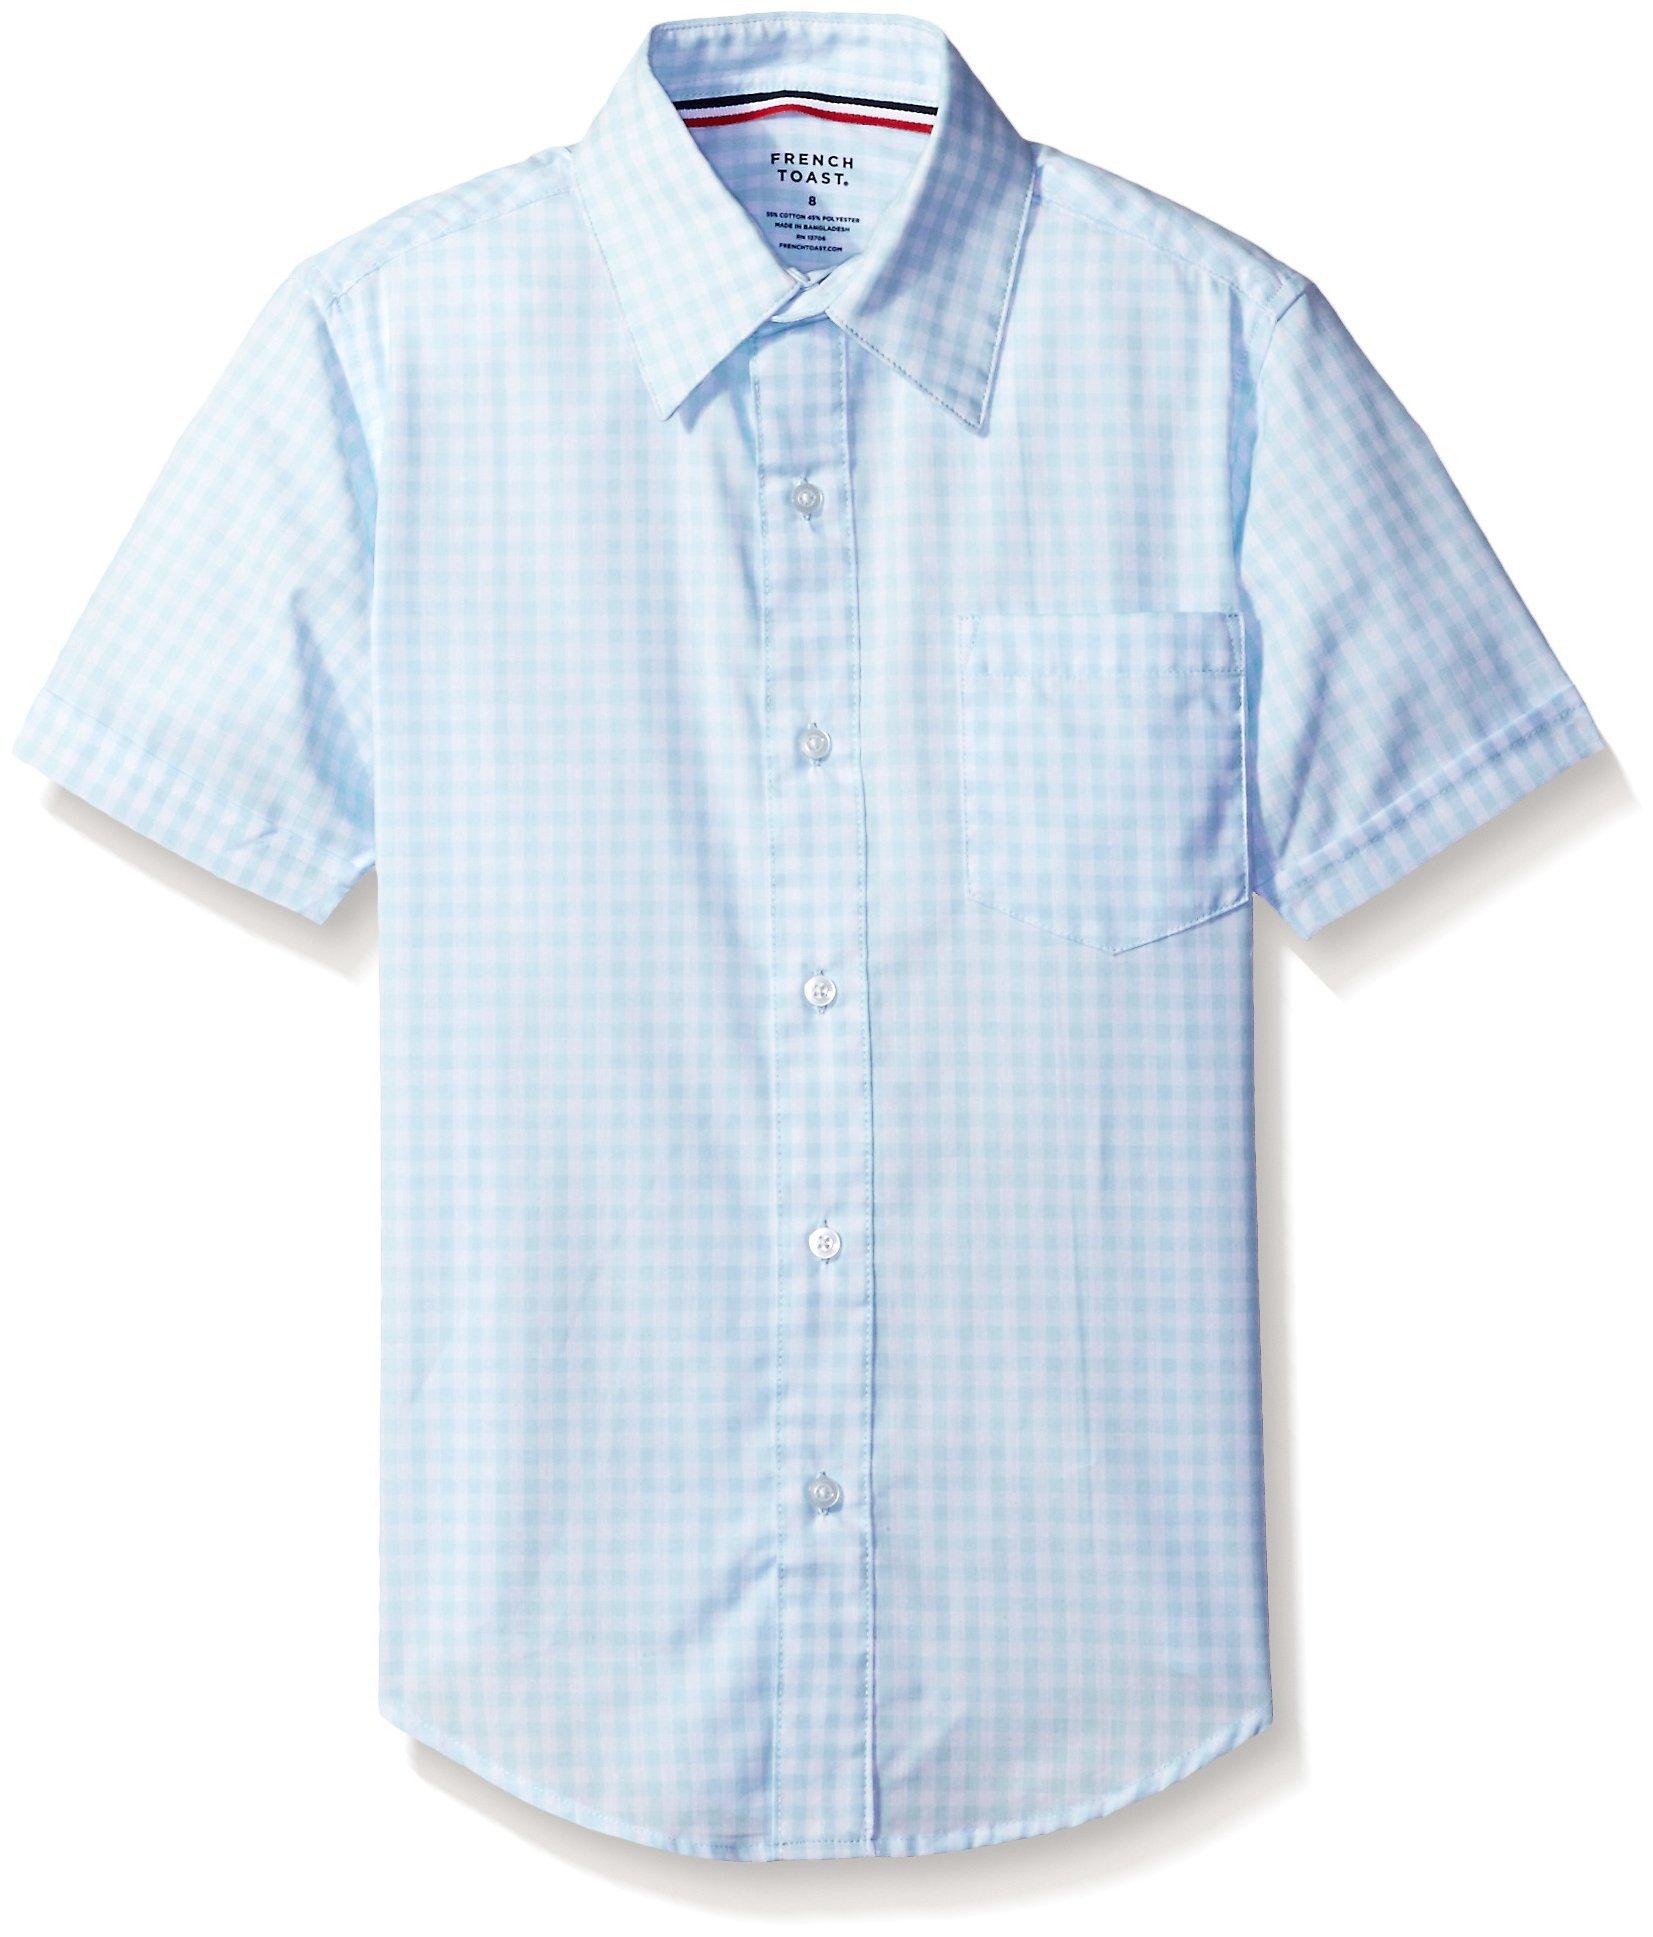 French Toast Big Boys' Short Sleeve Poplin Dress Shirt, Light Blue/White Gingham, 18